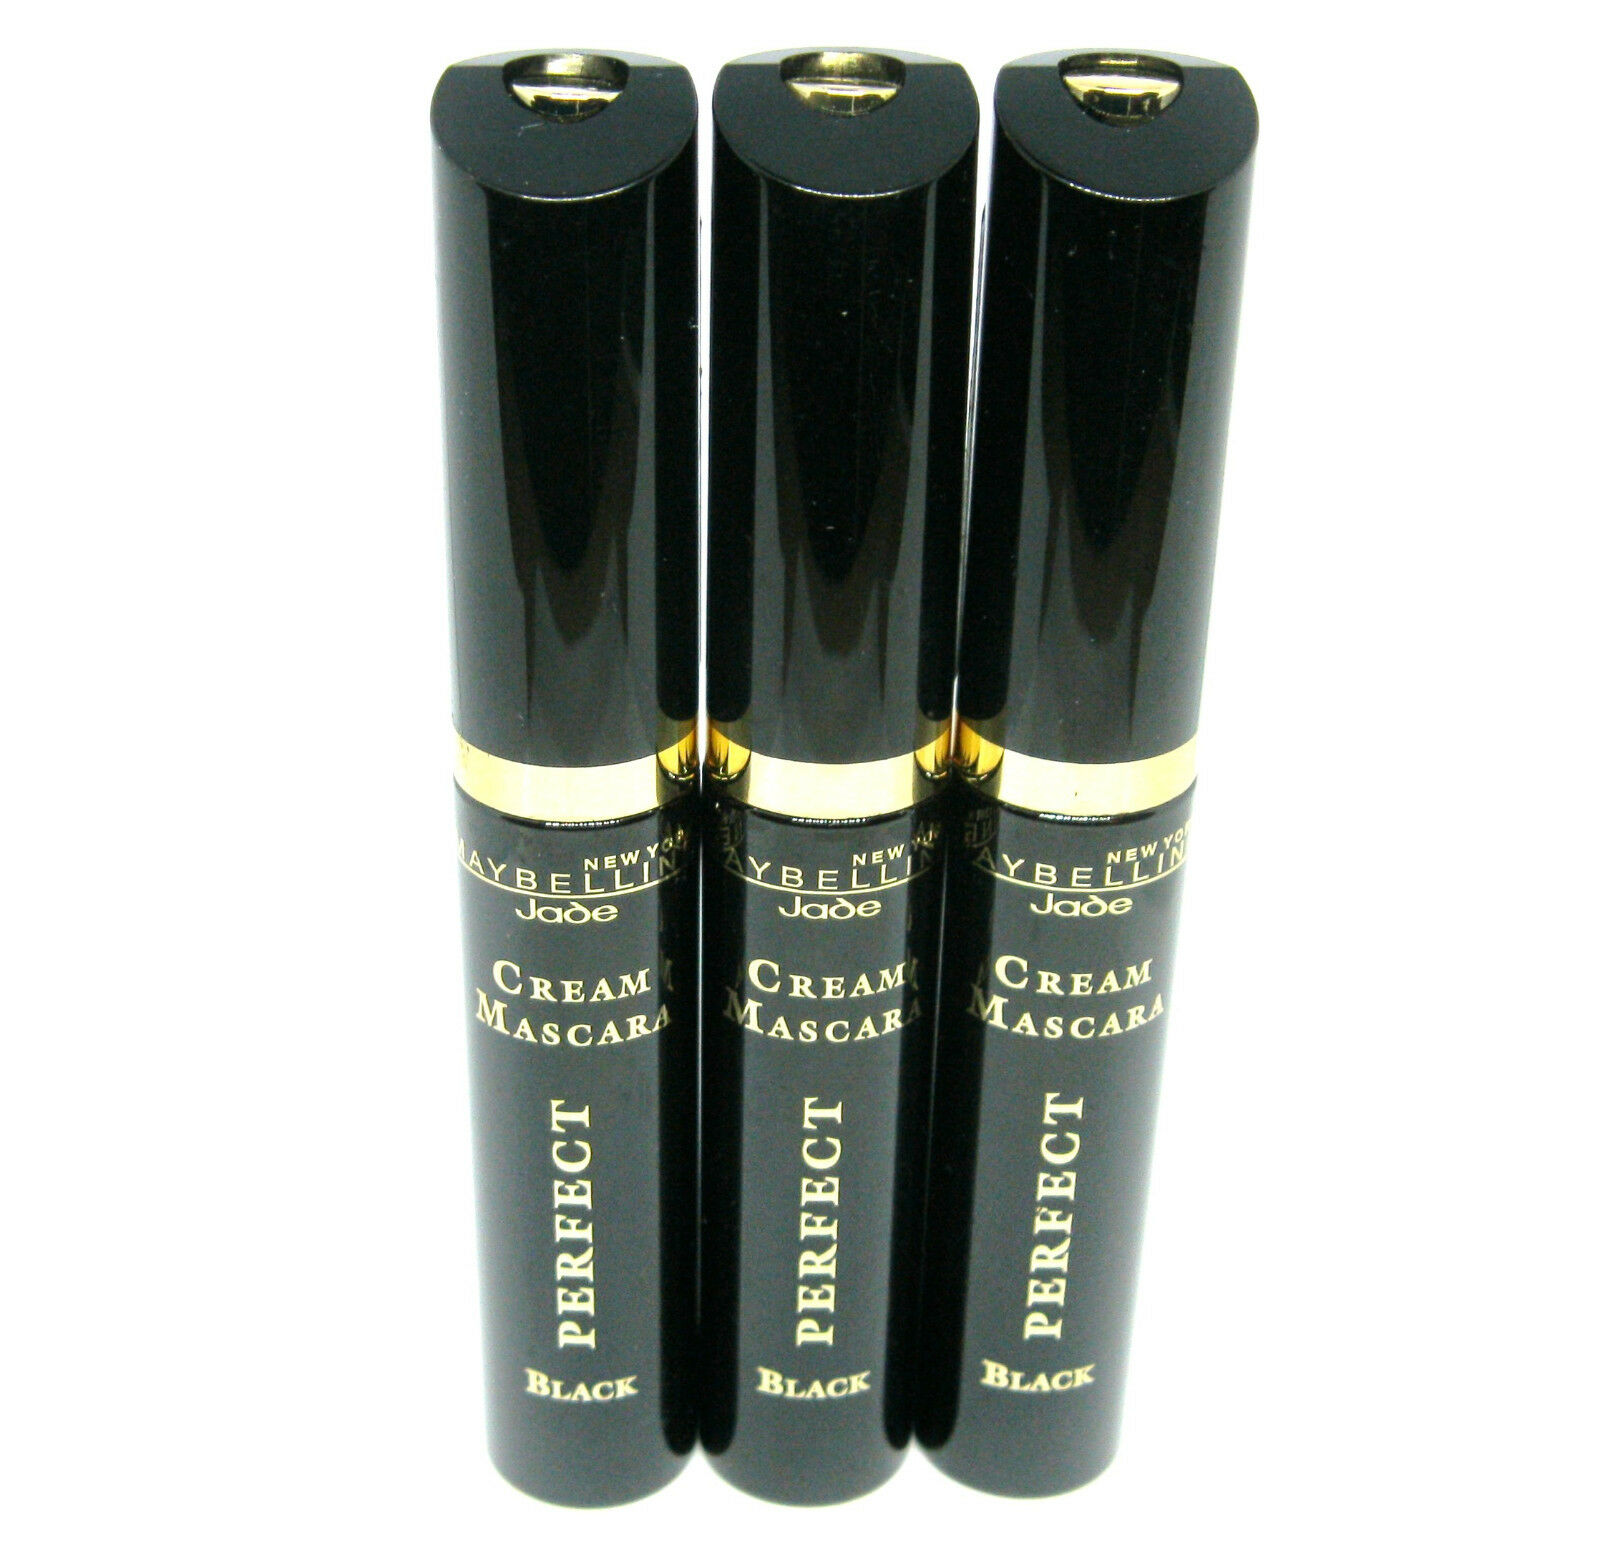 3 x MAYBELLINE CREAM MASCARA PERFECT BLACK / schwarz